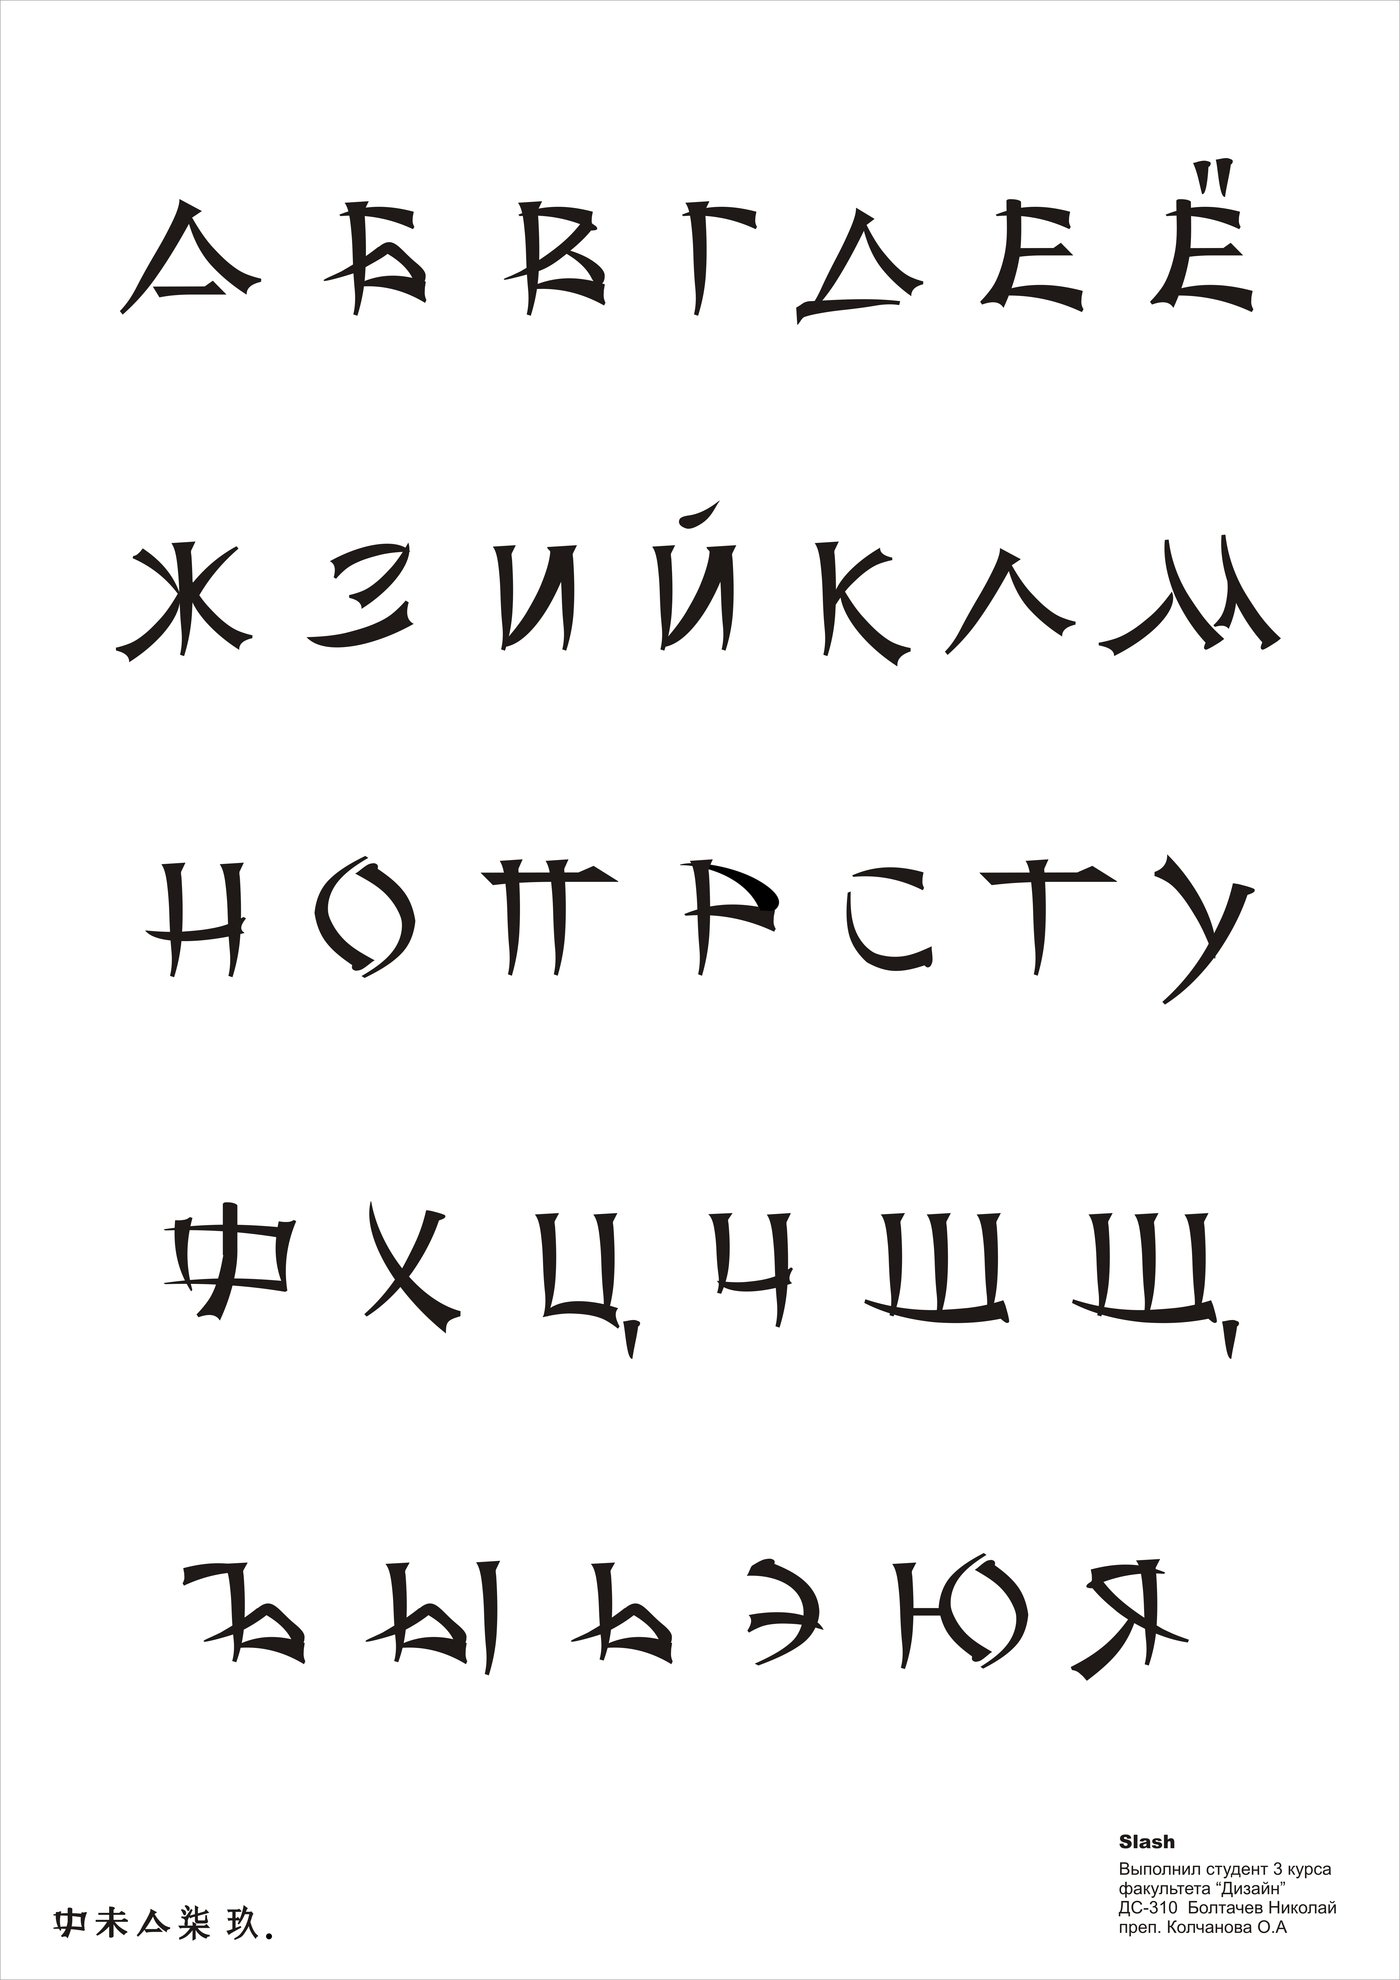 Font design by Nikolay Boltachev at Coroflot.com